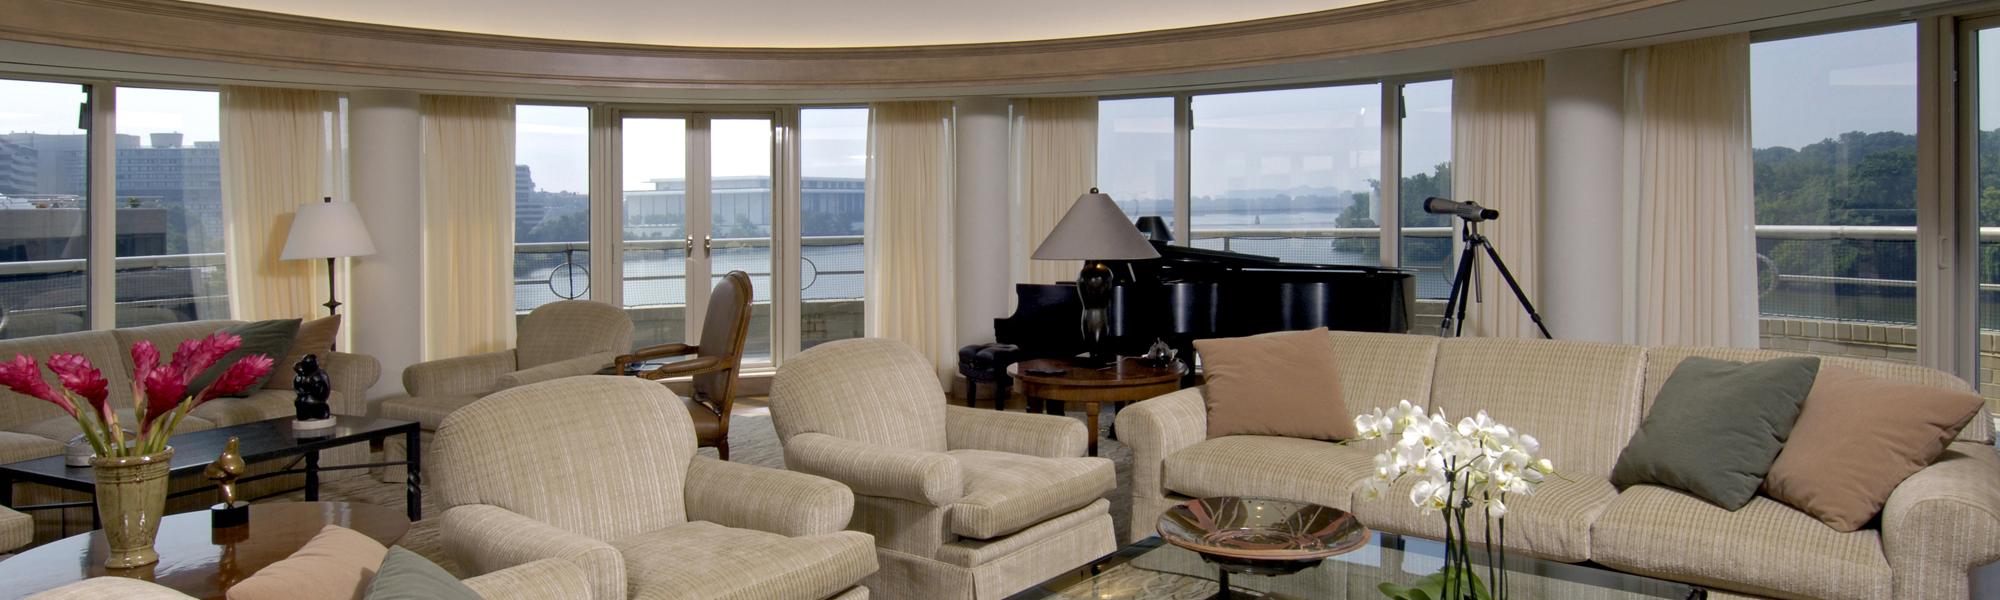 Condo renovations luxury condominium remodeling luxury renovations design build experts bowa